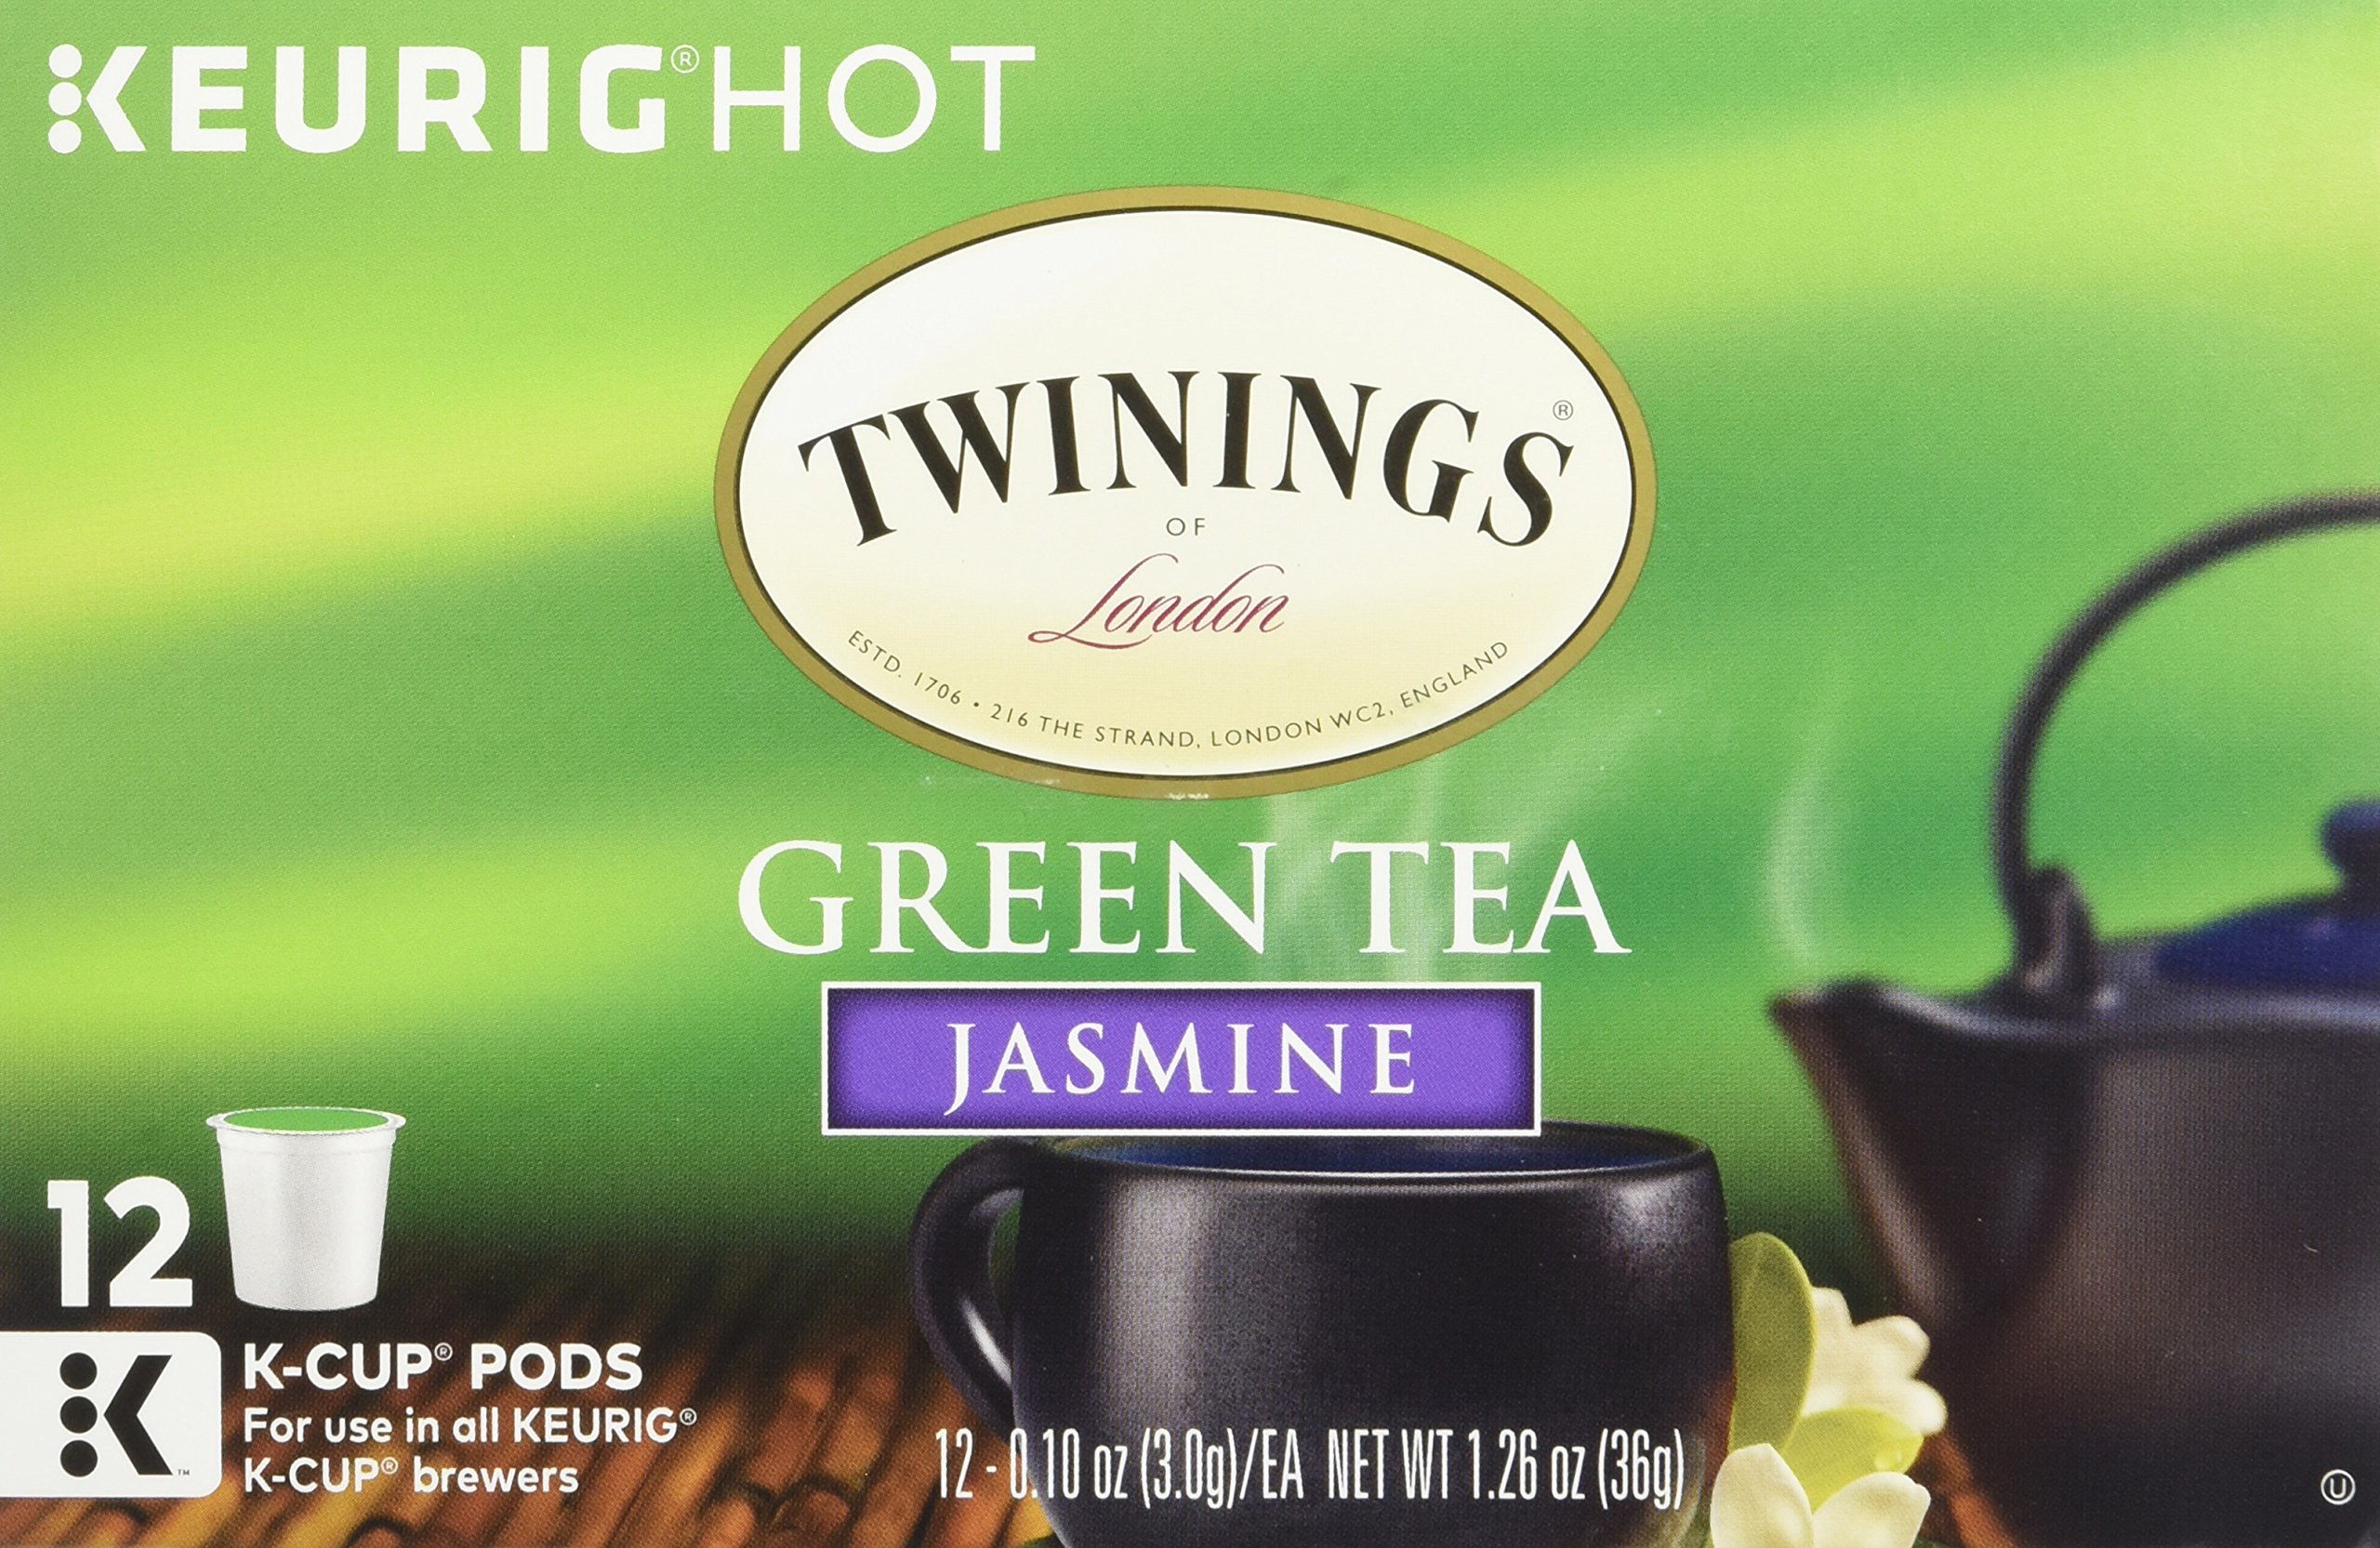 Twinings of London Jasmine Green K-Cups for Keurig, 12 Count (Pack of 6)